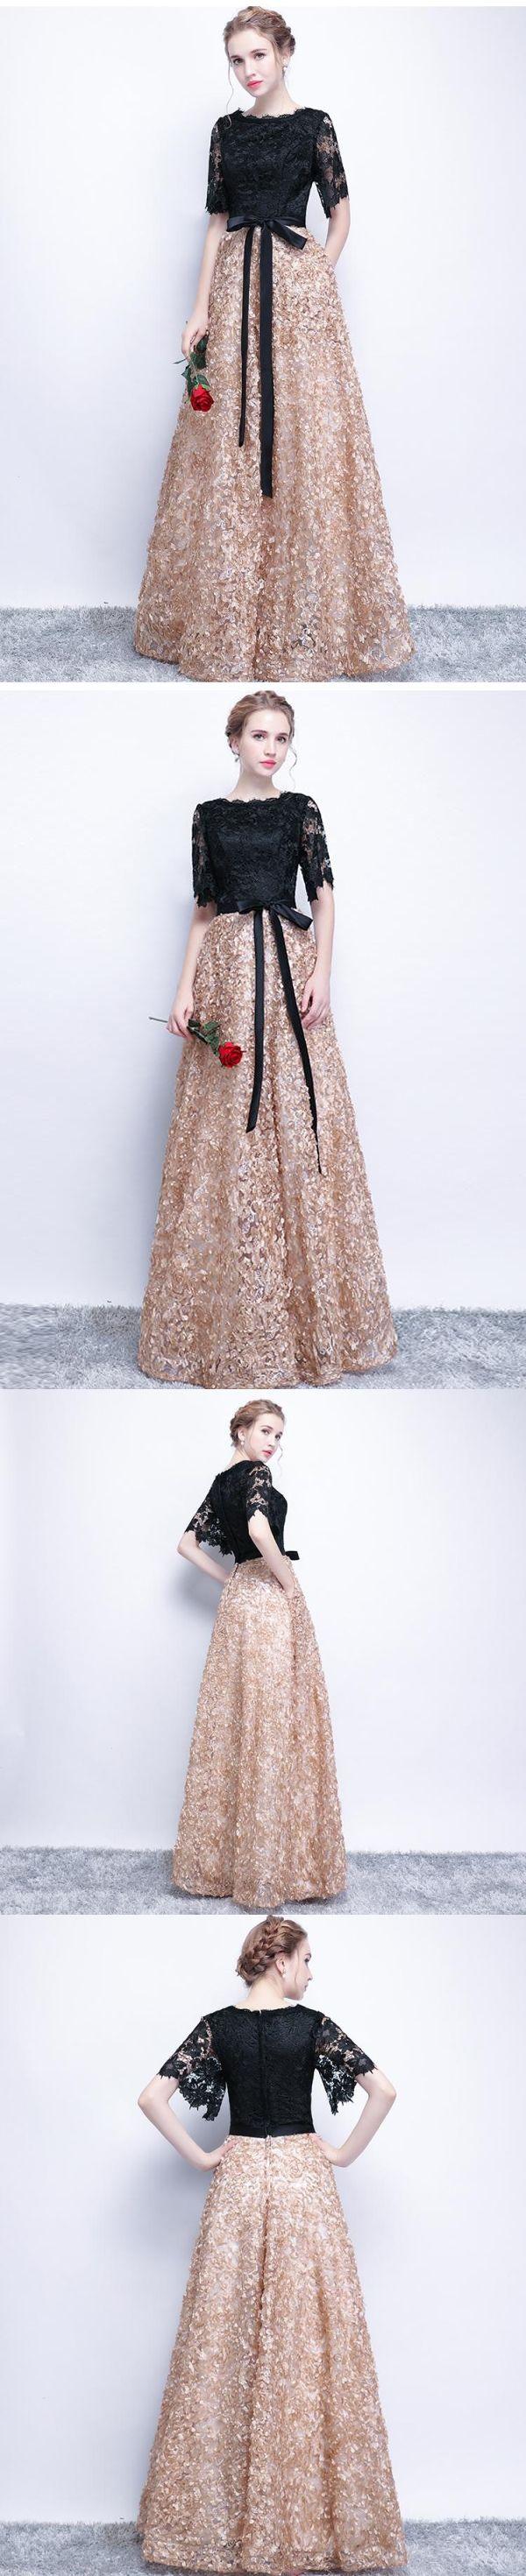 Black prom dresses aline half sleeve long prom dress sexy evening